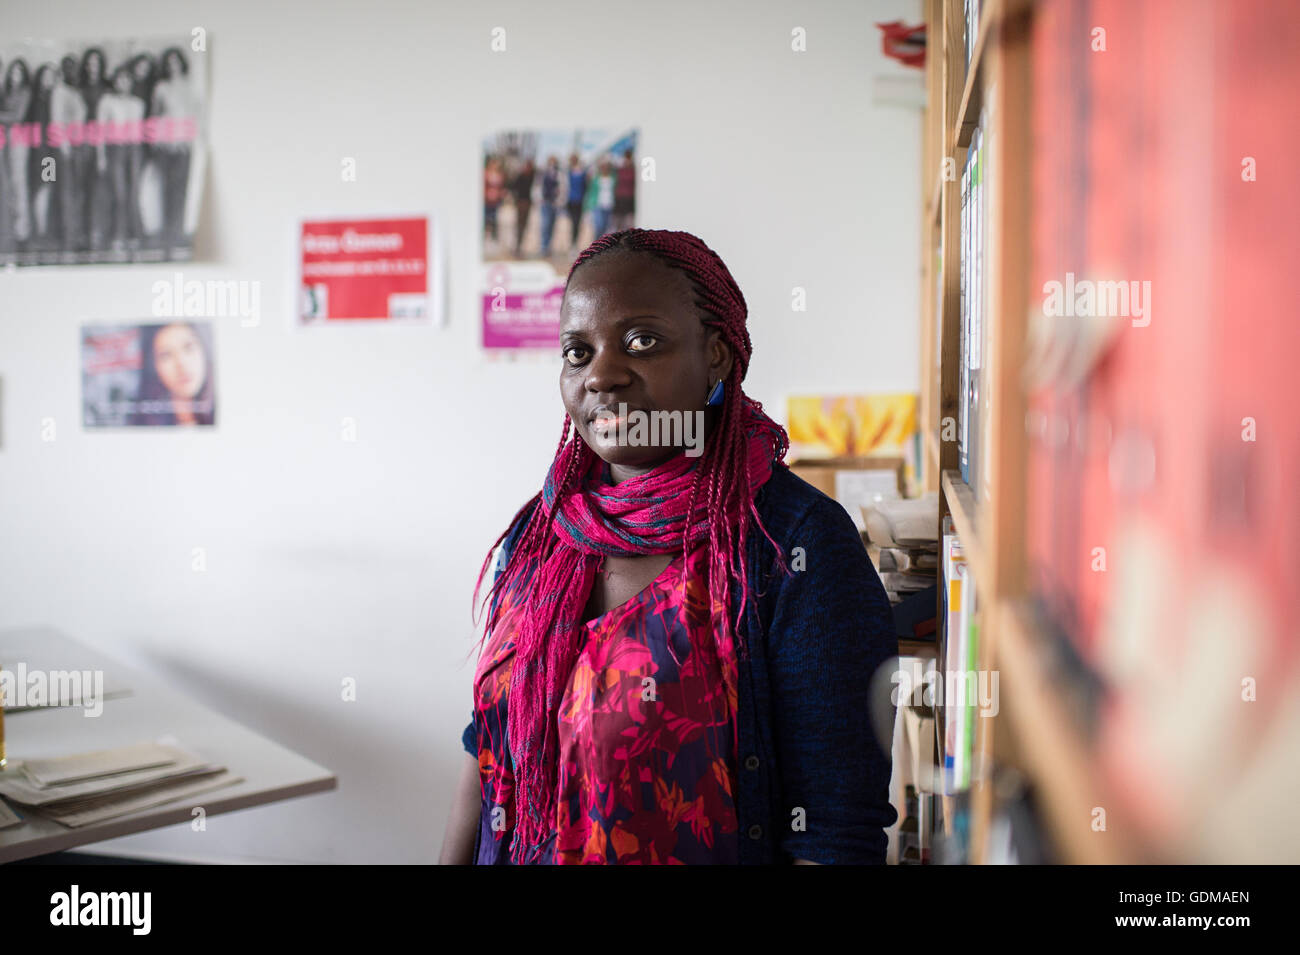 Berlin, Germany. 18th July, 2016. Ida Nabatereegga, speaker for the organization 'Terre des Femmes' stands - Stock Image